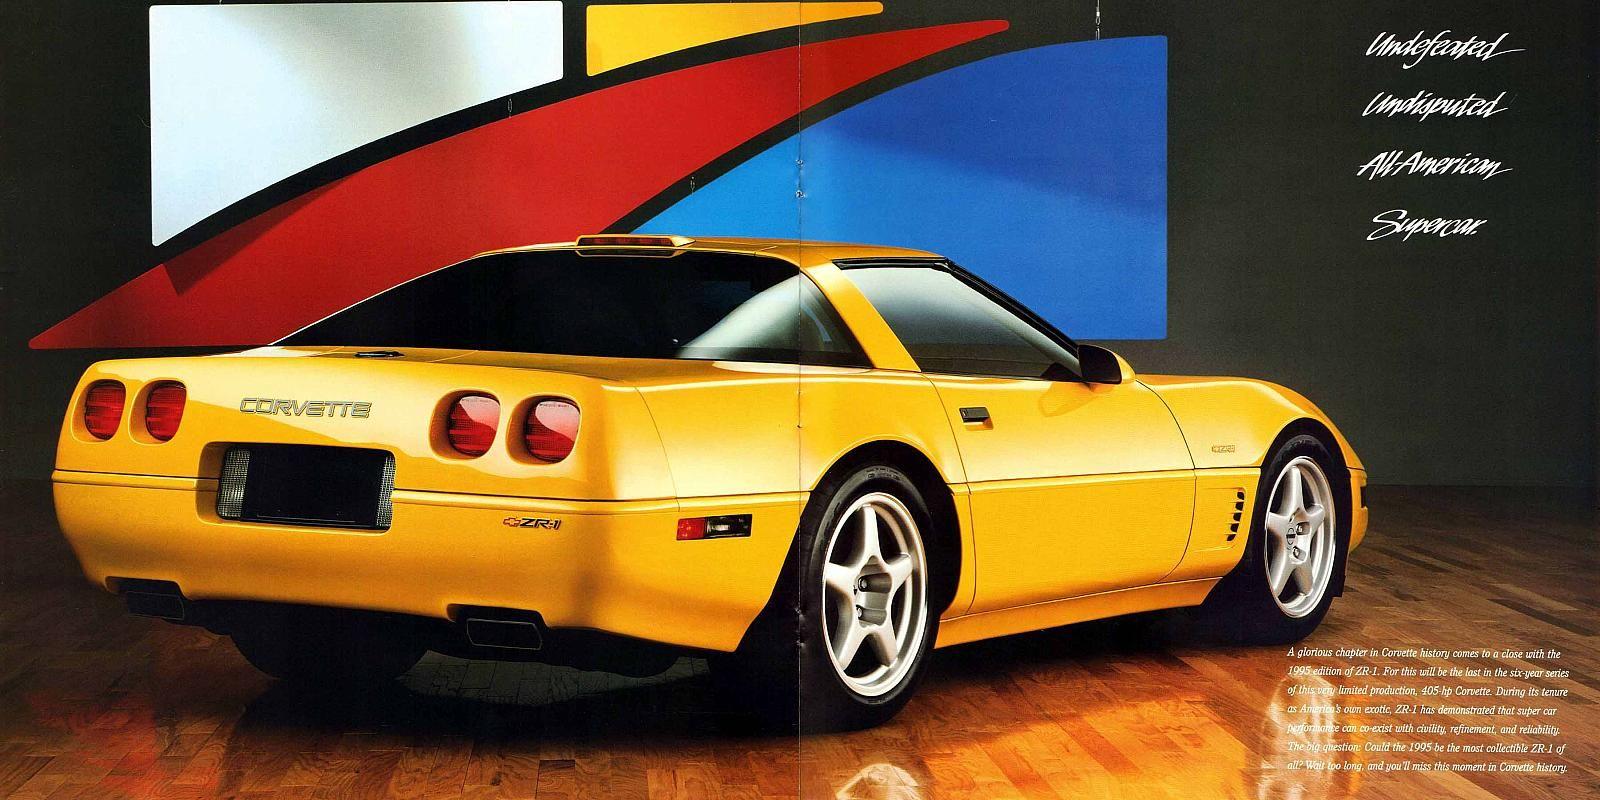 c4 corvette | C4 Chevrolet Corvettes - 1986 Models | corvette ...